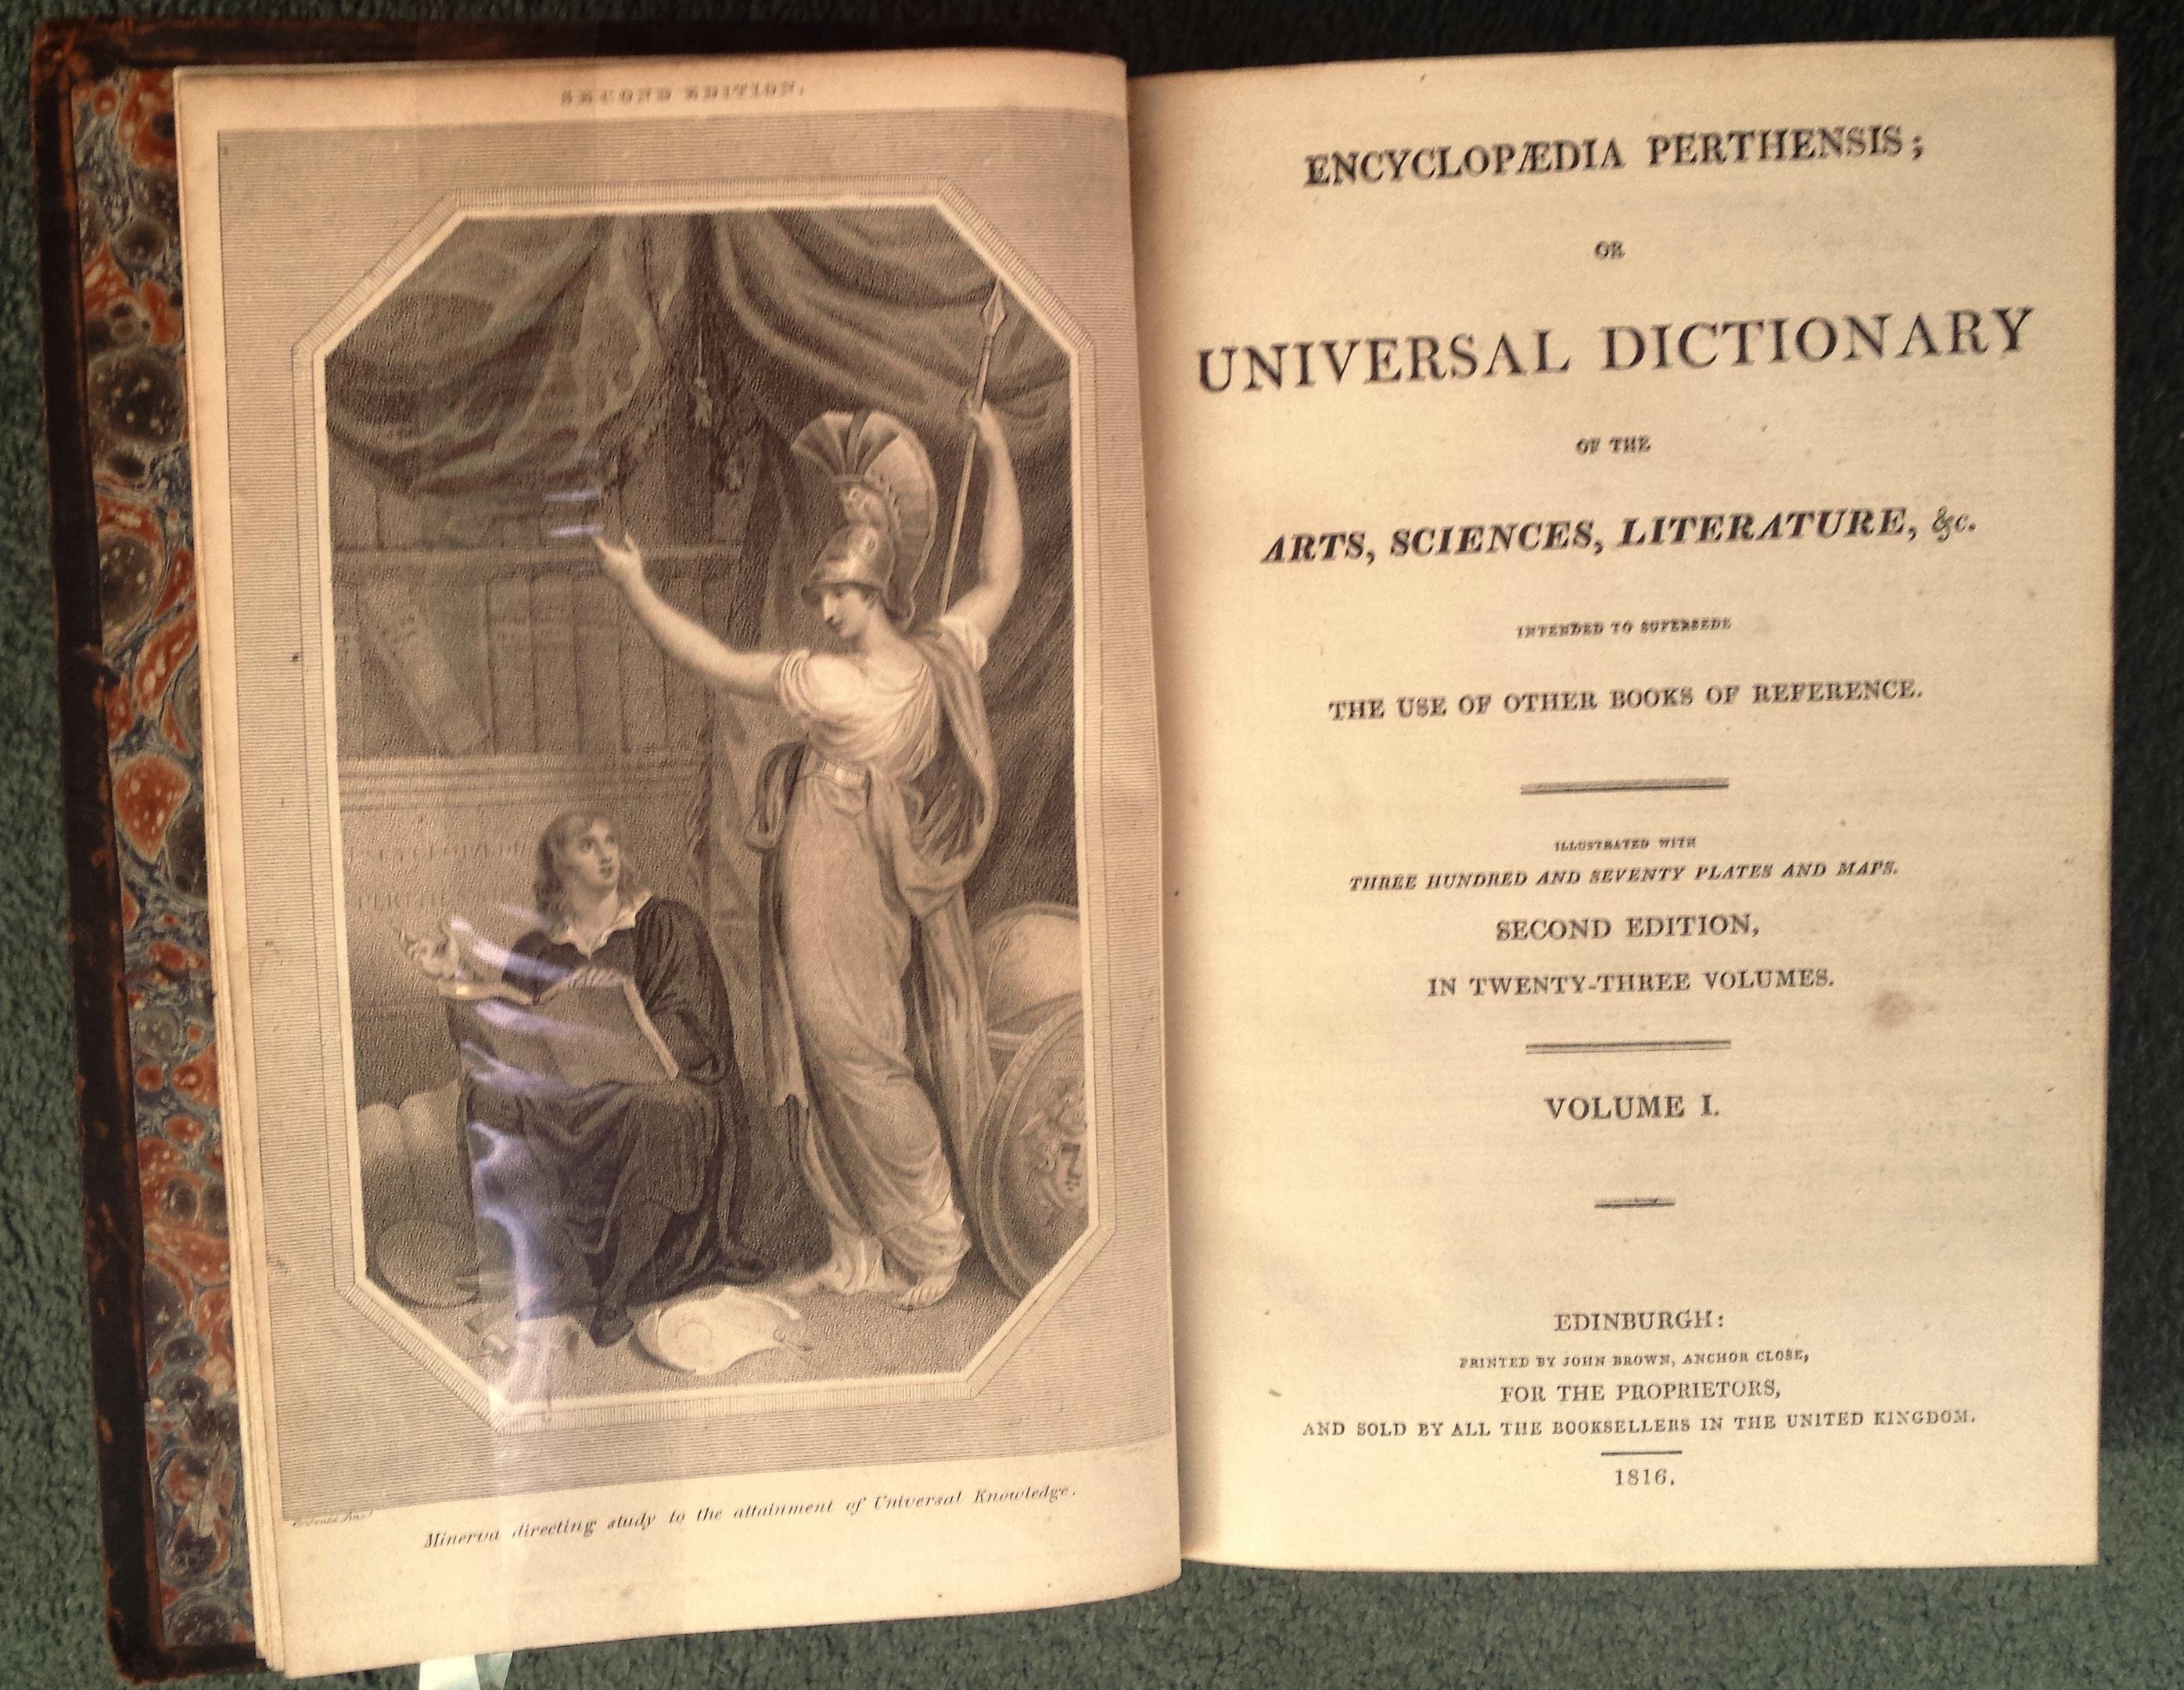 Encyclopaedia Perthensis, £1800